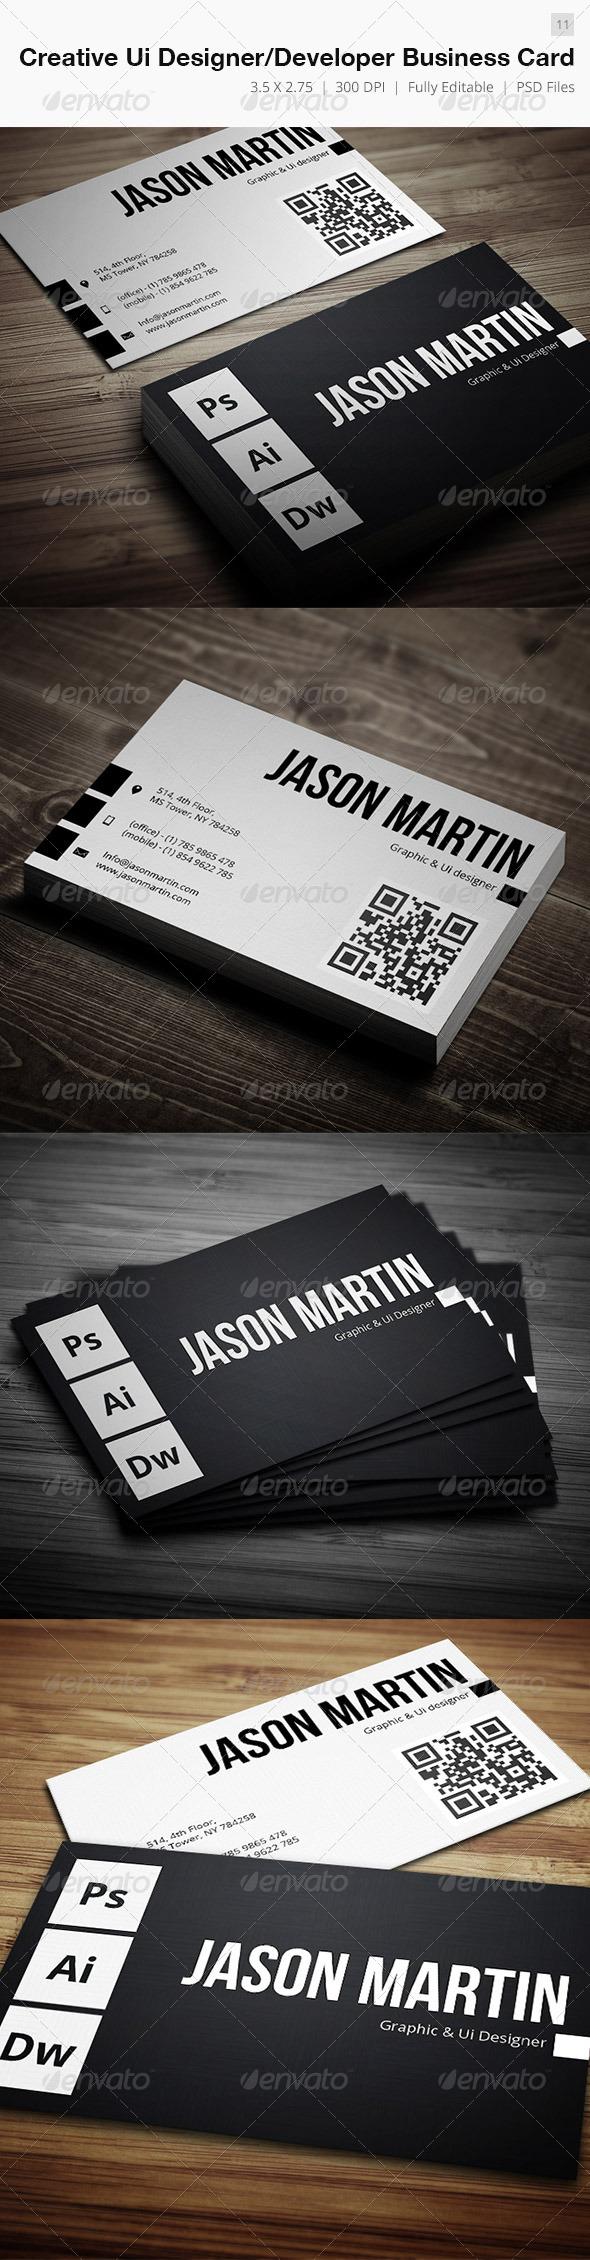 Creative Ui Designer Developer Business Card - 11 - Creative Business Cards